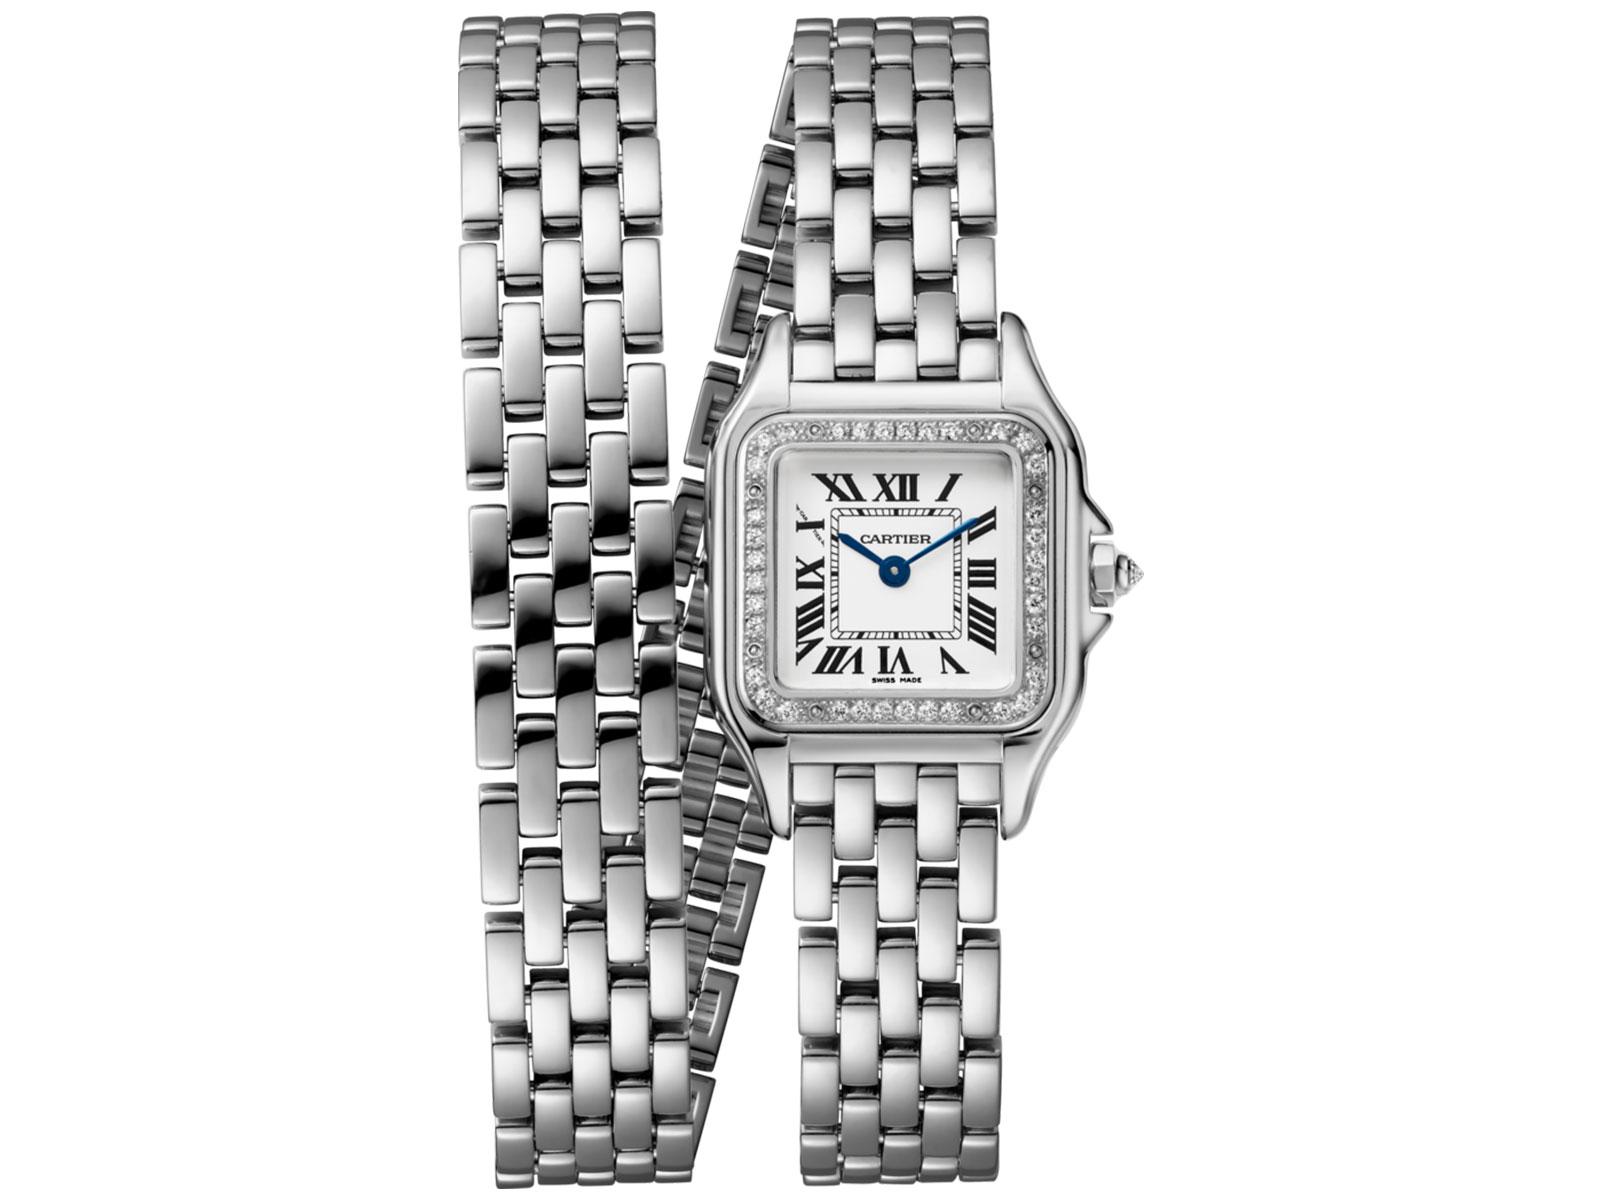 Panthere-de-Cartier-Watch-Collection-2.jpg